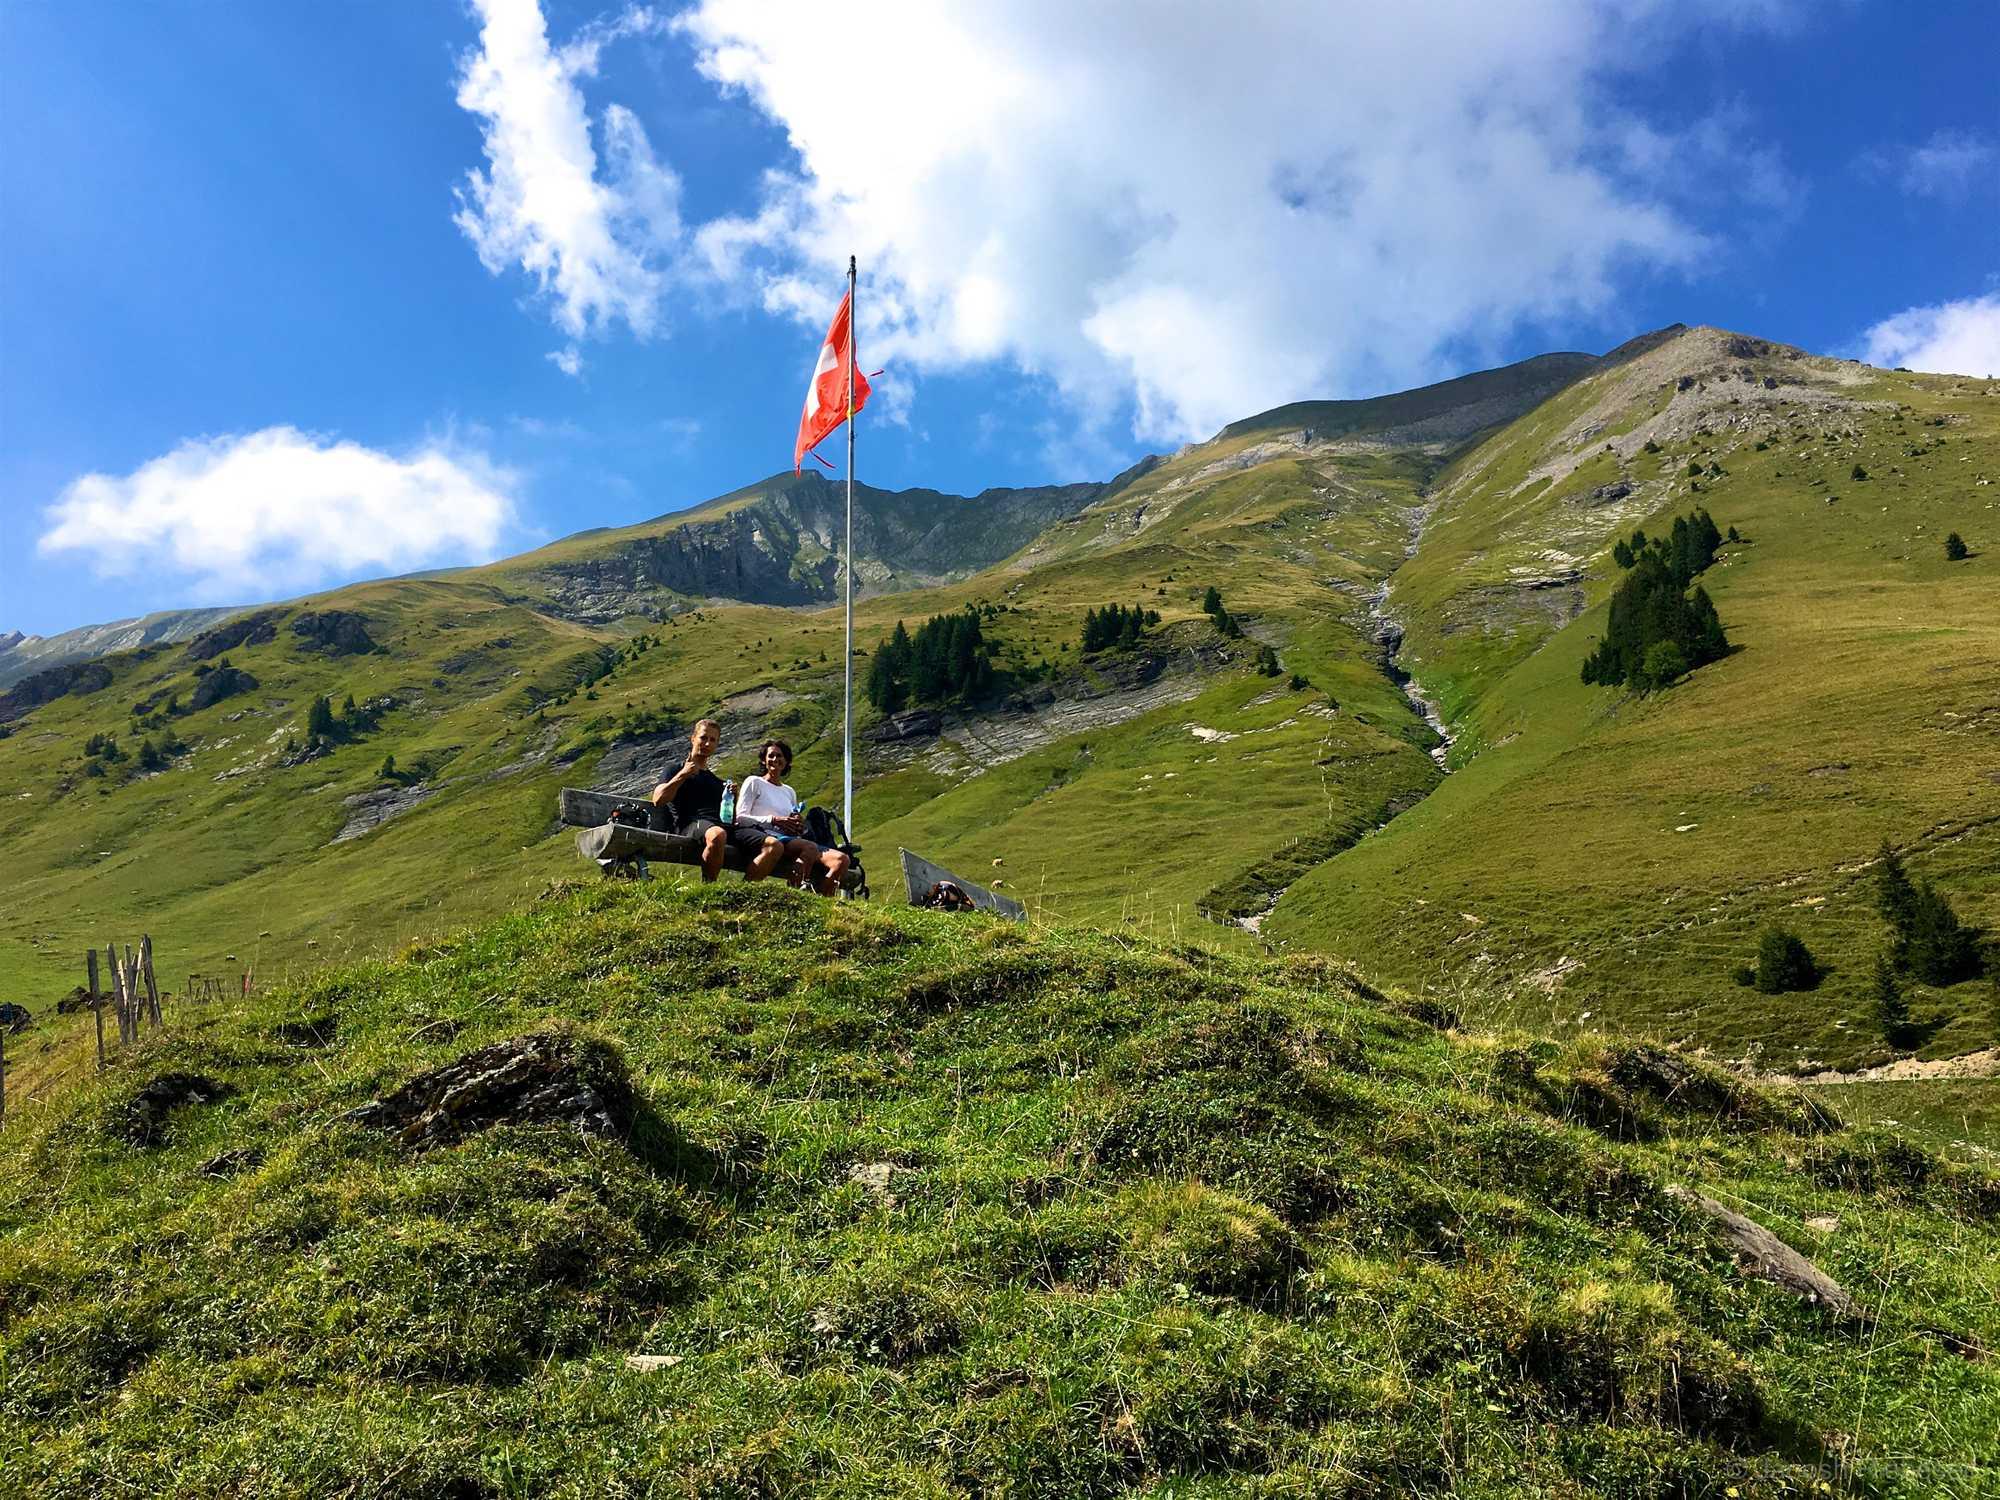 Bern Pasture